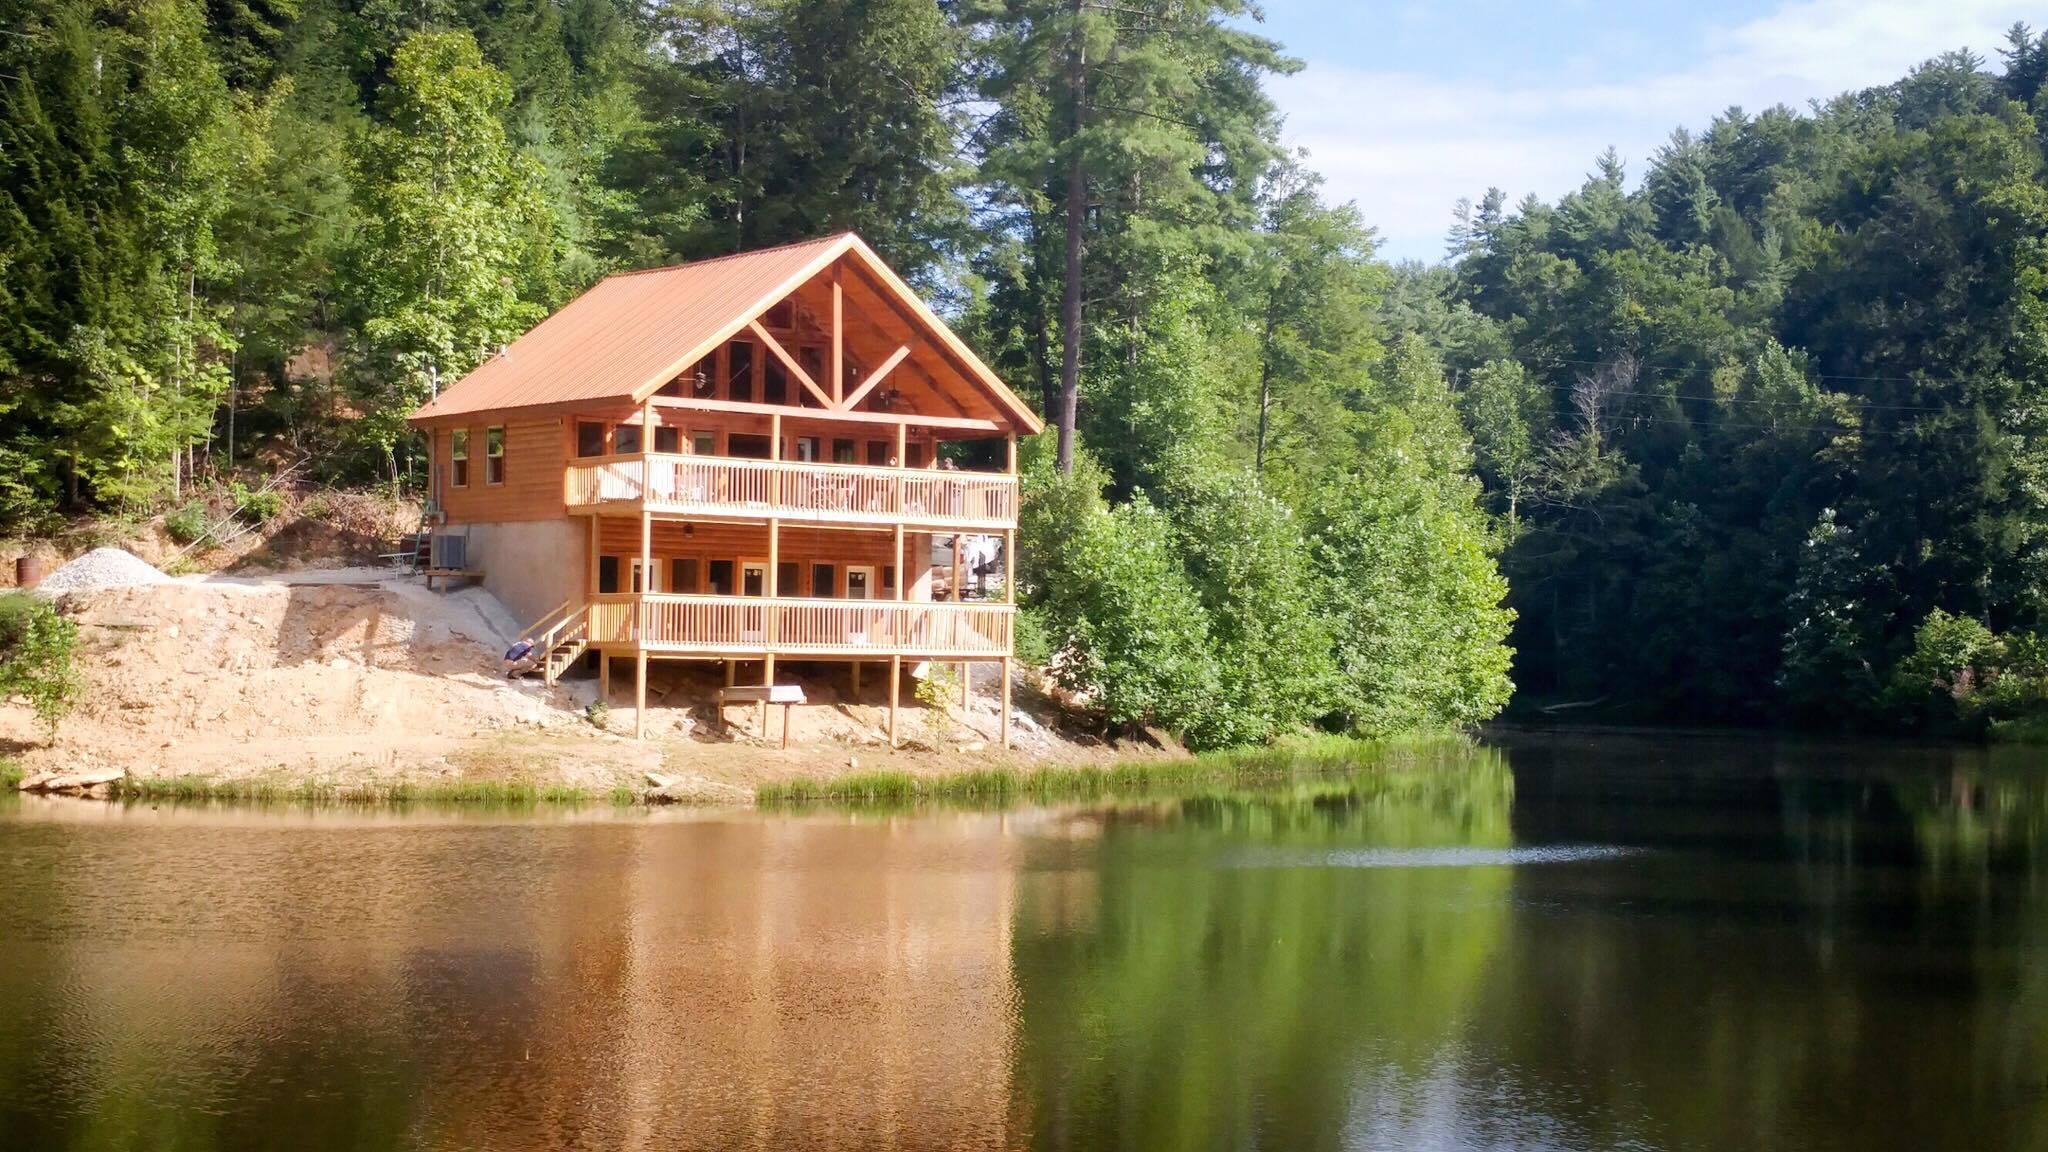 1 Bedroom Cabin Rentals Cabins At Red River Gorge 5 Star Cabin Rentals